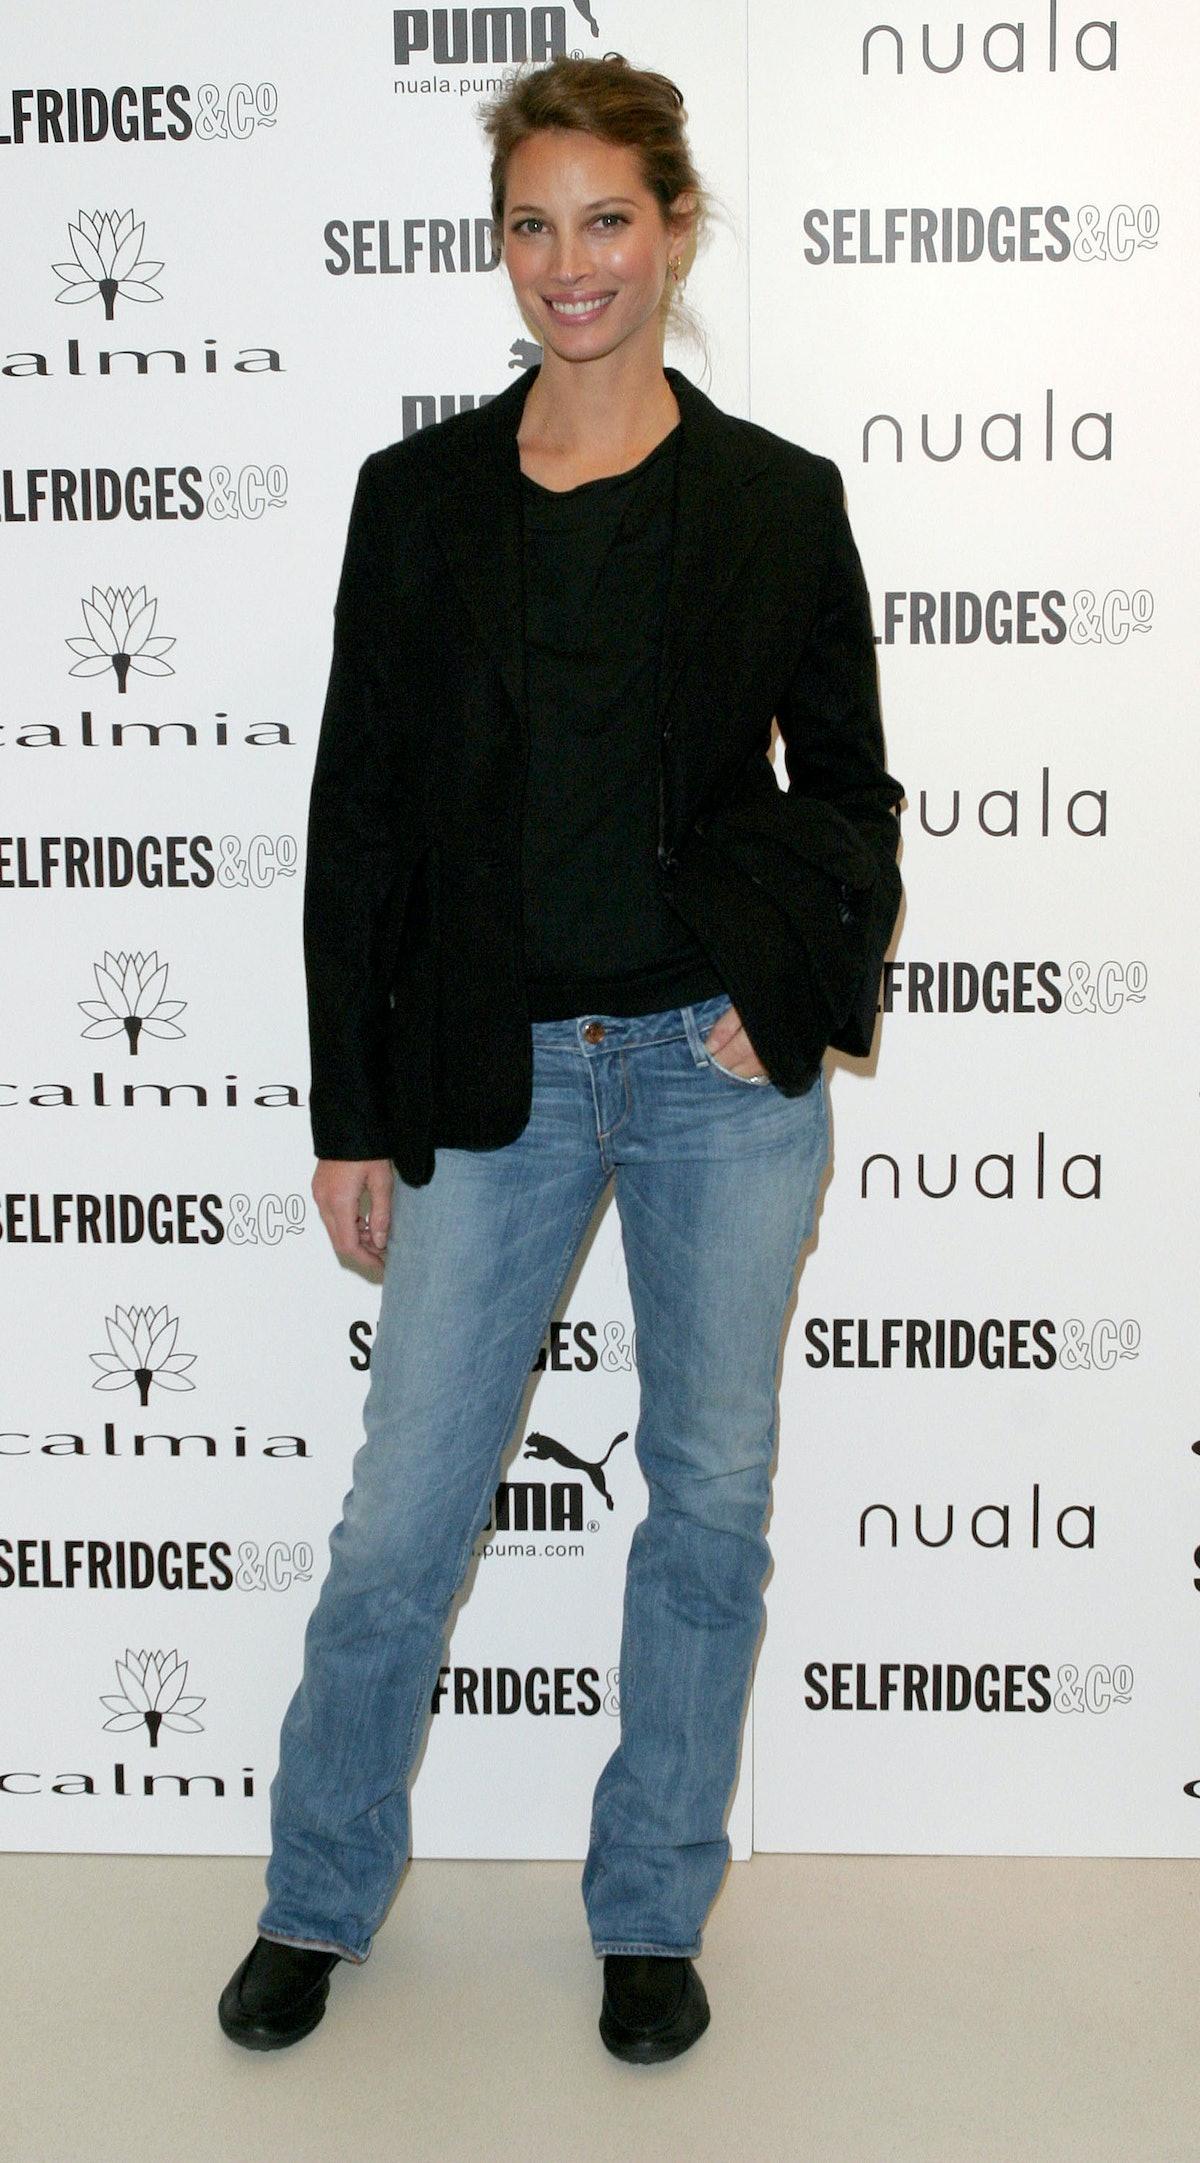 Christy Turlington Launches Her Spring 2005 Puma Nuala Range